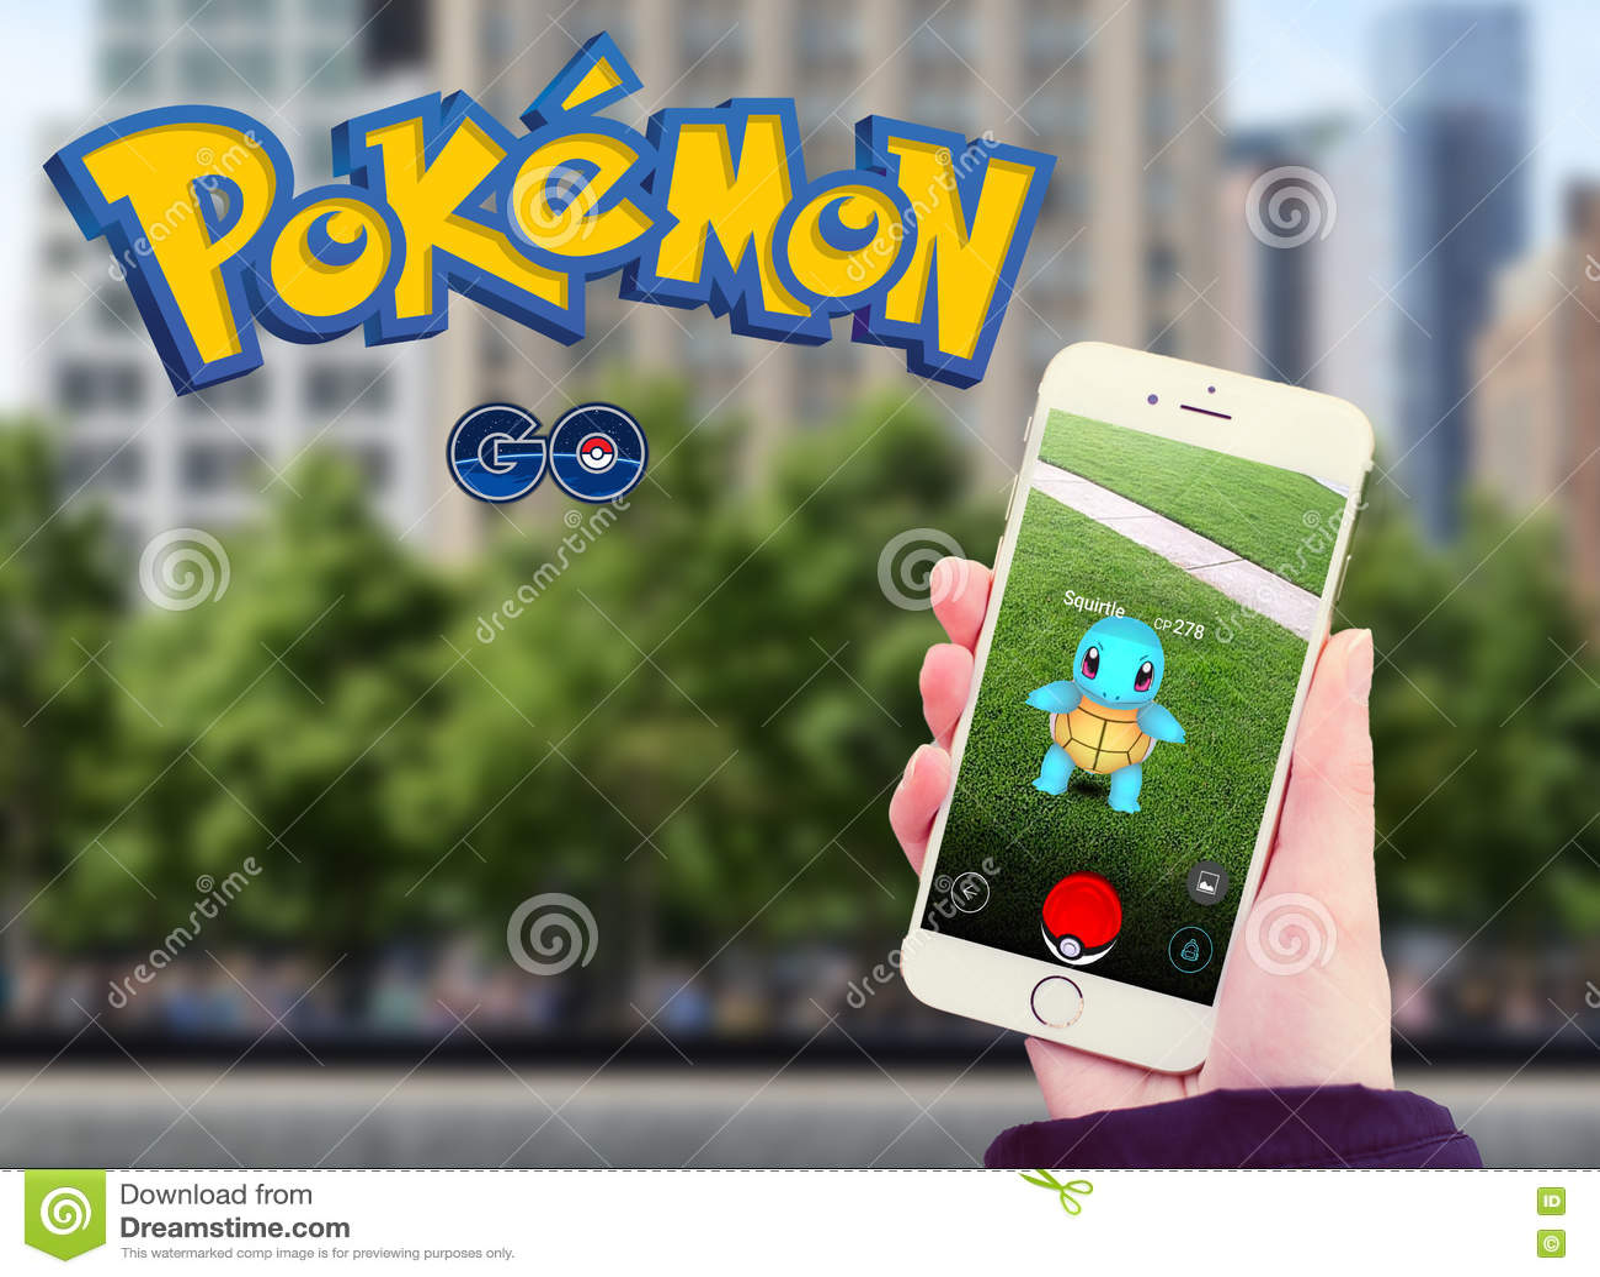 Pokemon Go in mobile With Logo